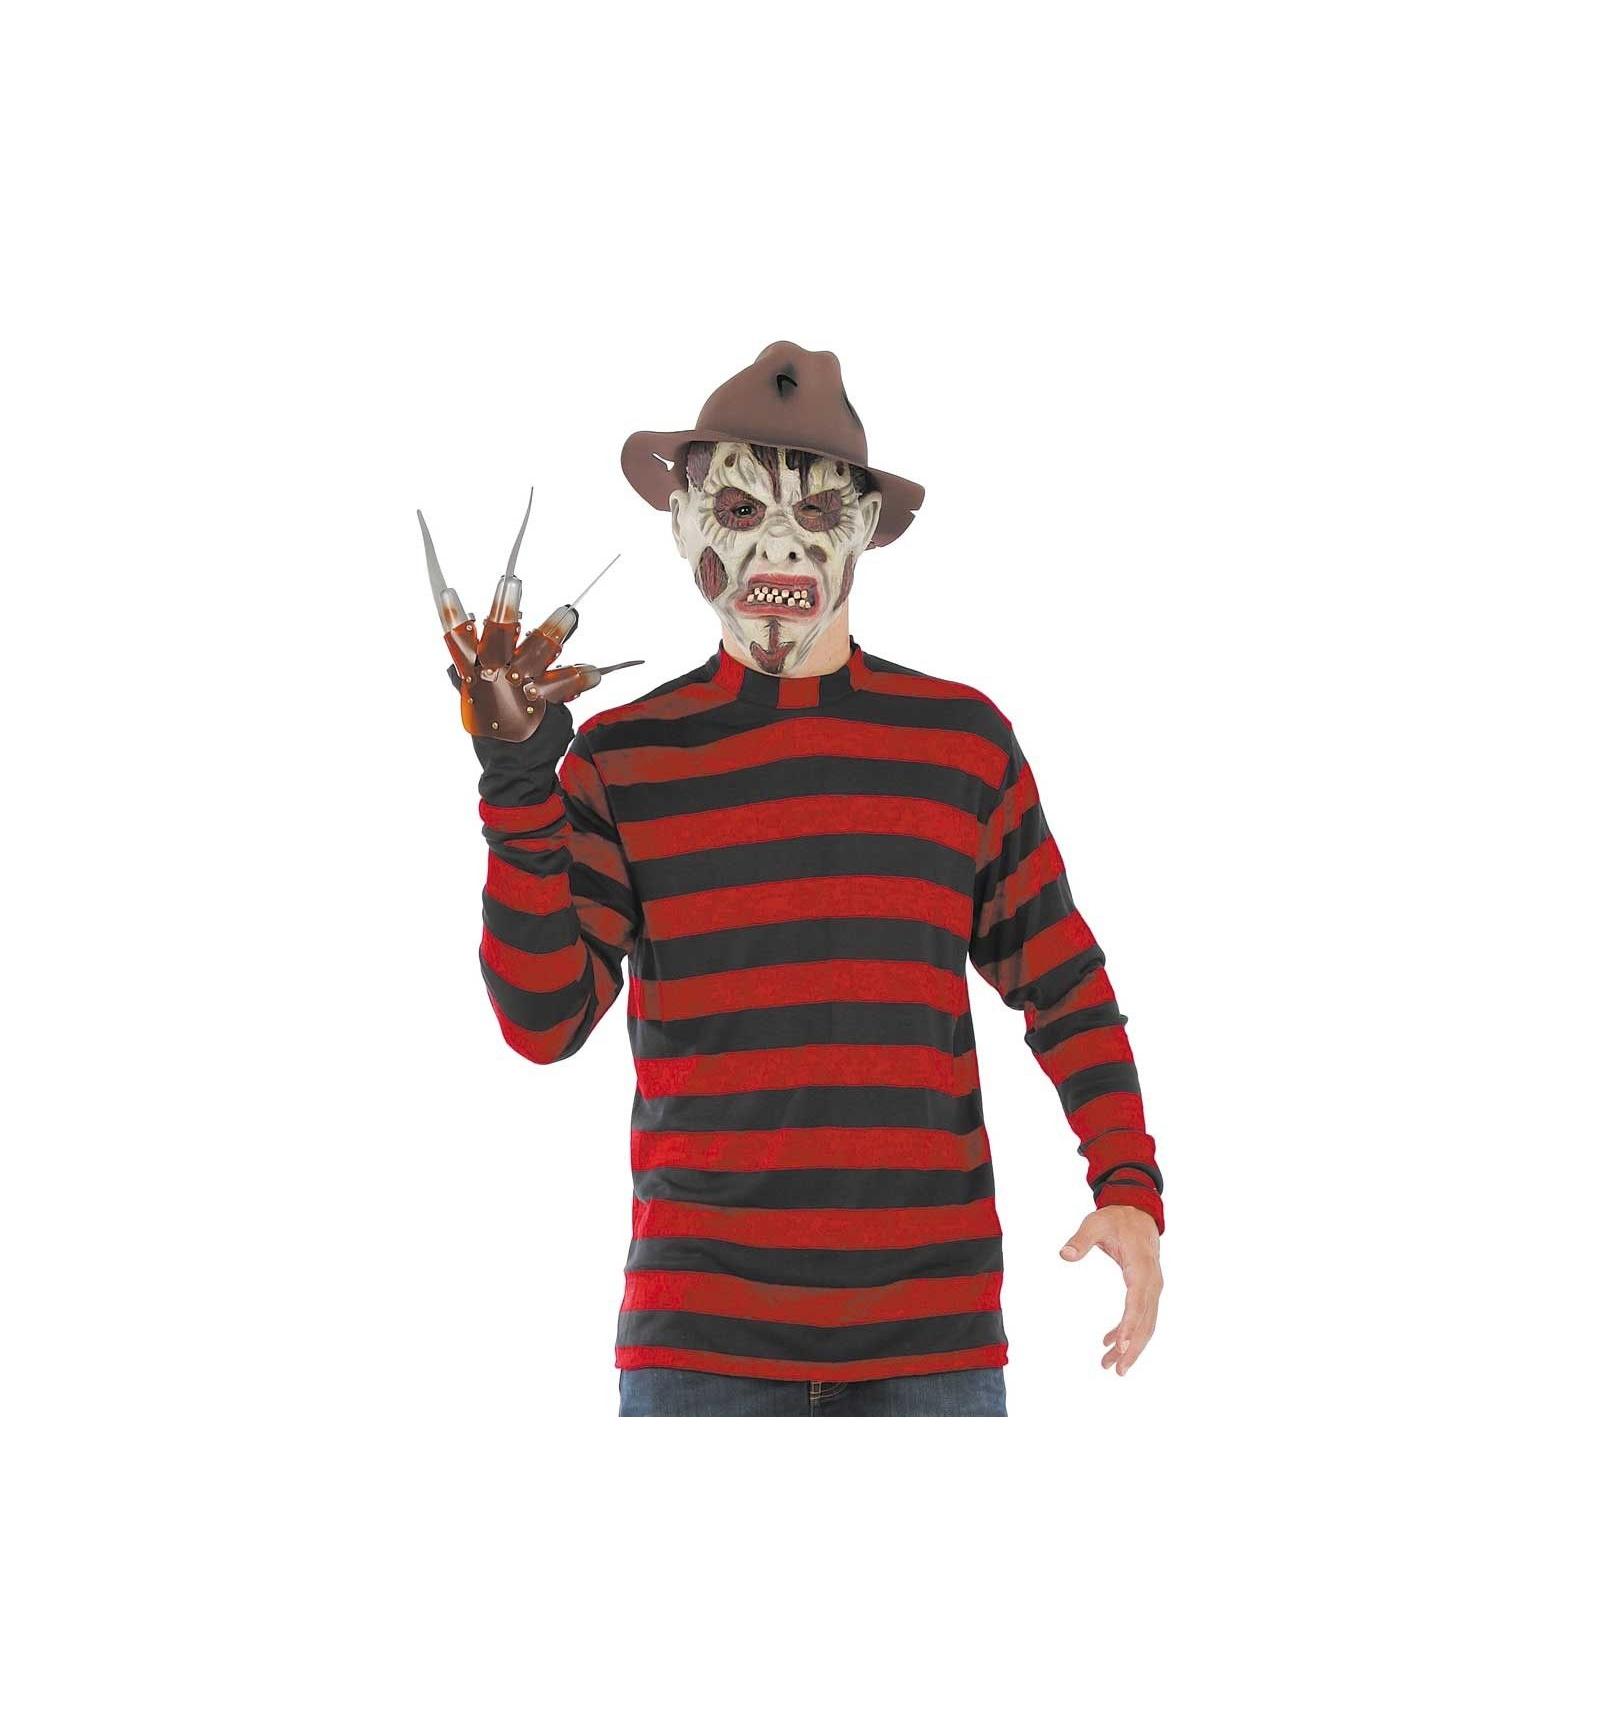 freddy krueger pullover - your online costume store